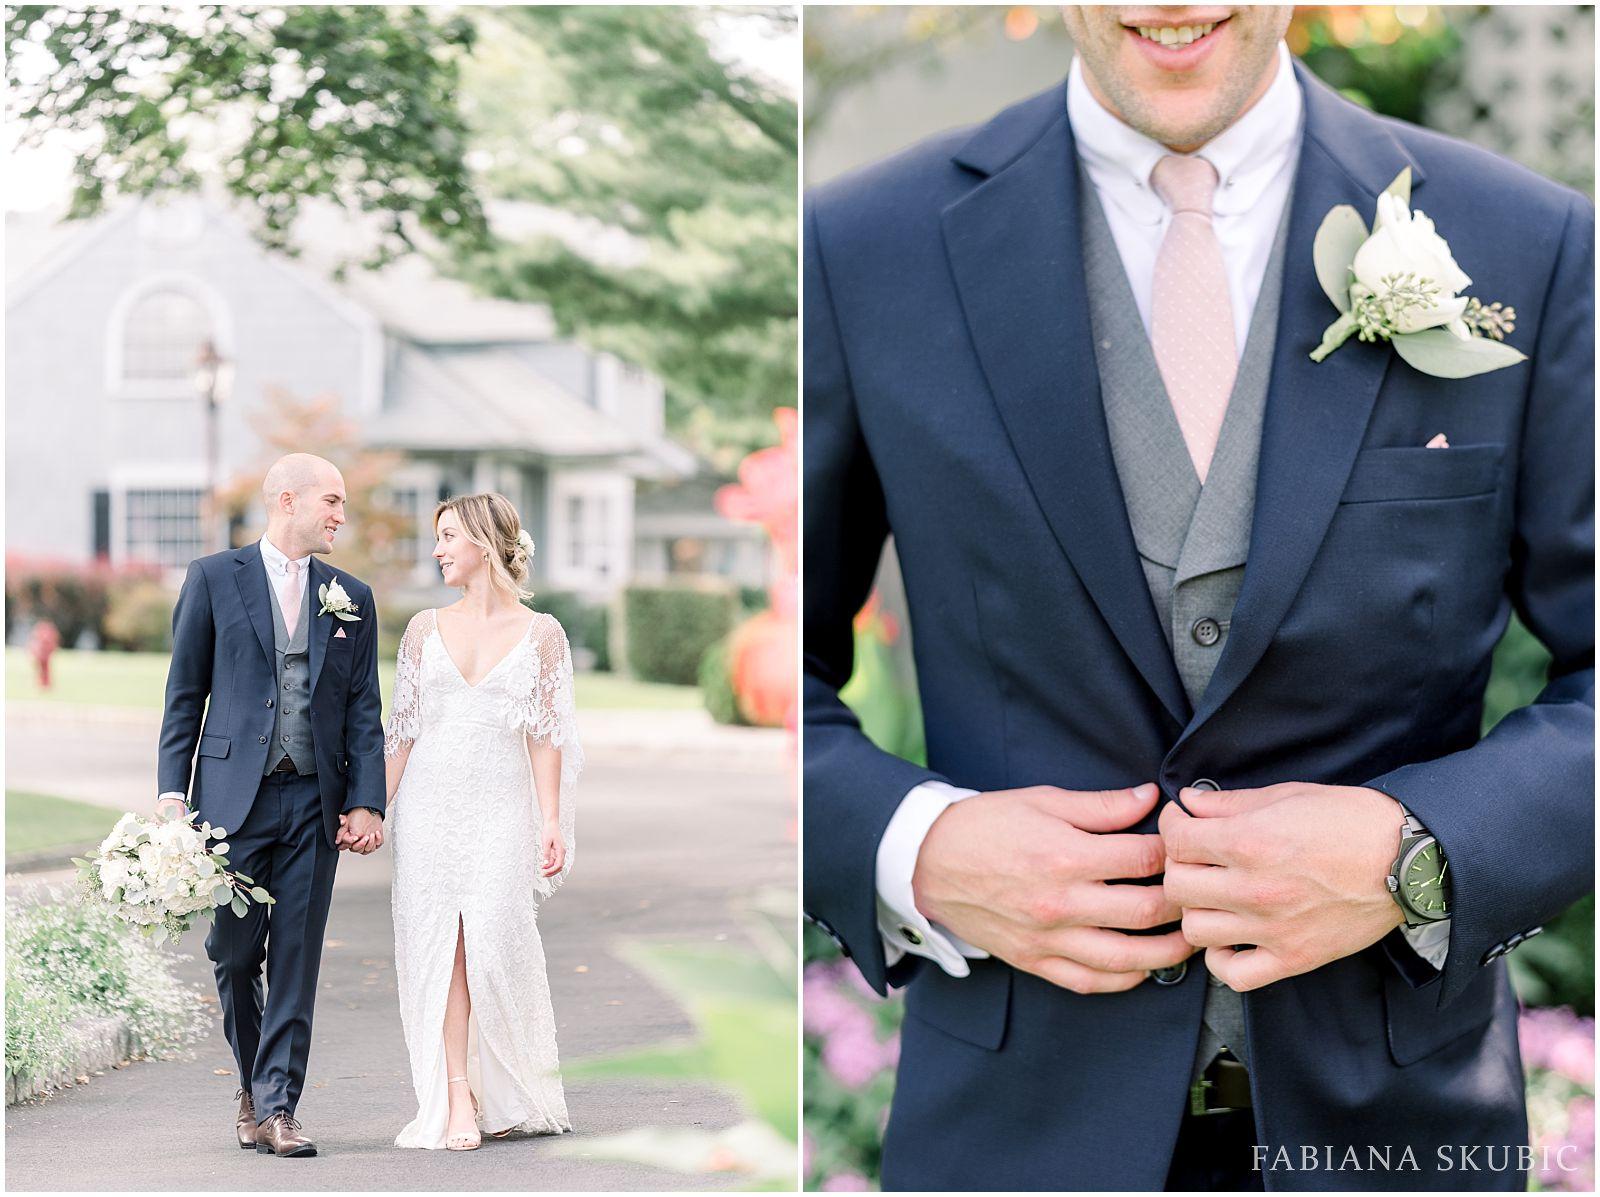 FabianaSkubic_H&M_Wedding_0029.jpg